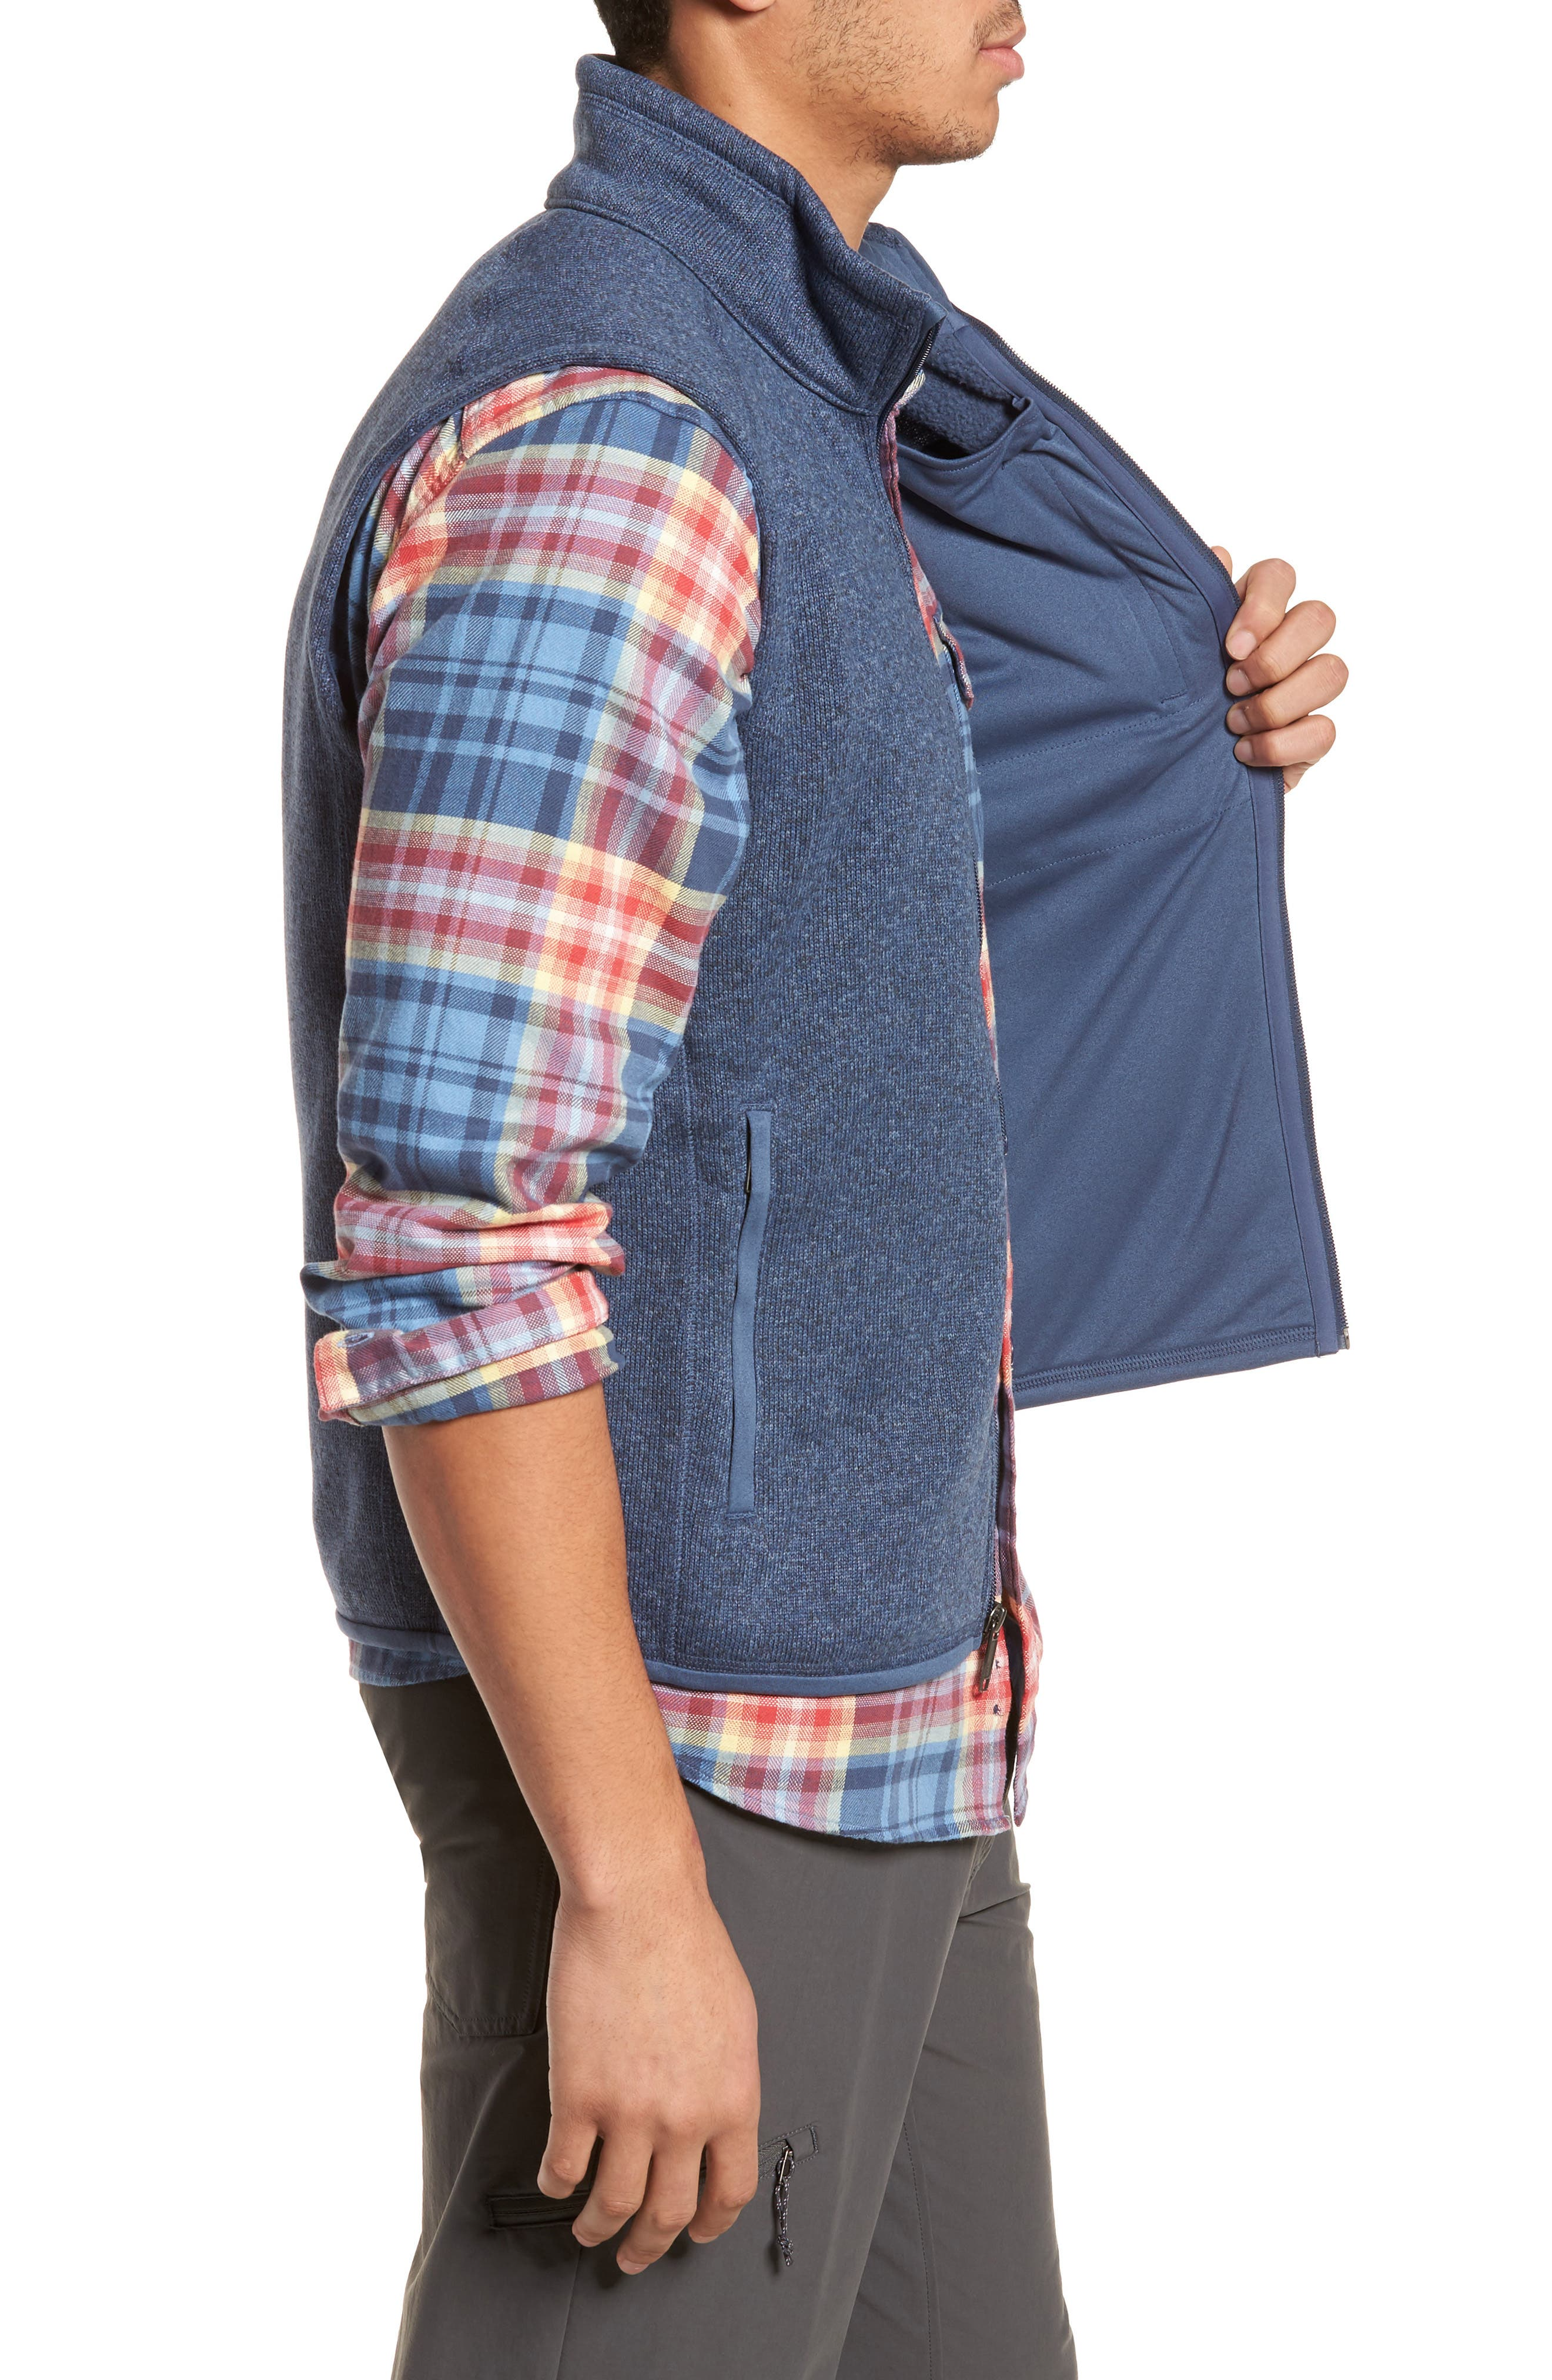 PATAGONIA, 'Better Sweater' Zip Front Vest, Alternate thumbnail 3, color, DOLOMITE BLUE